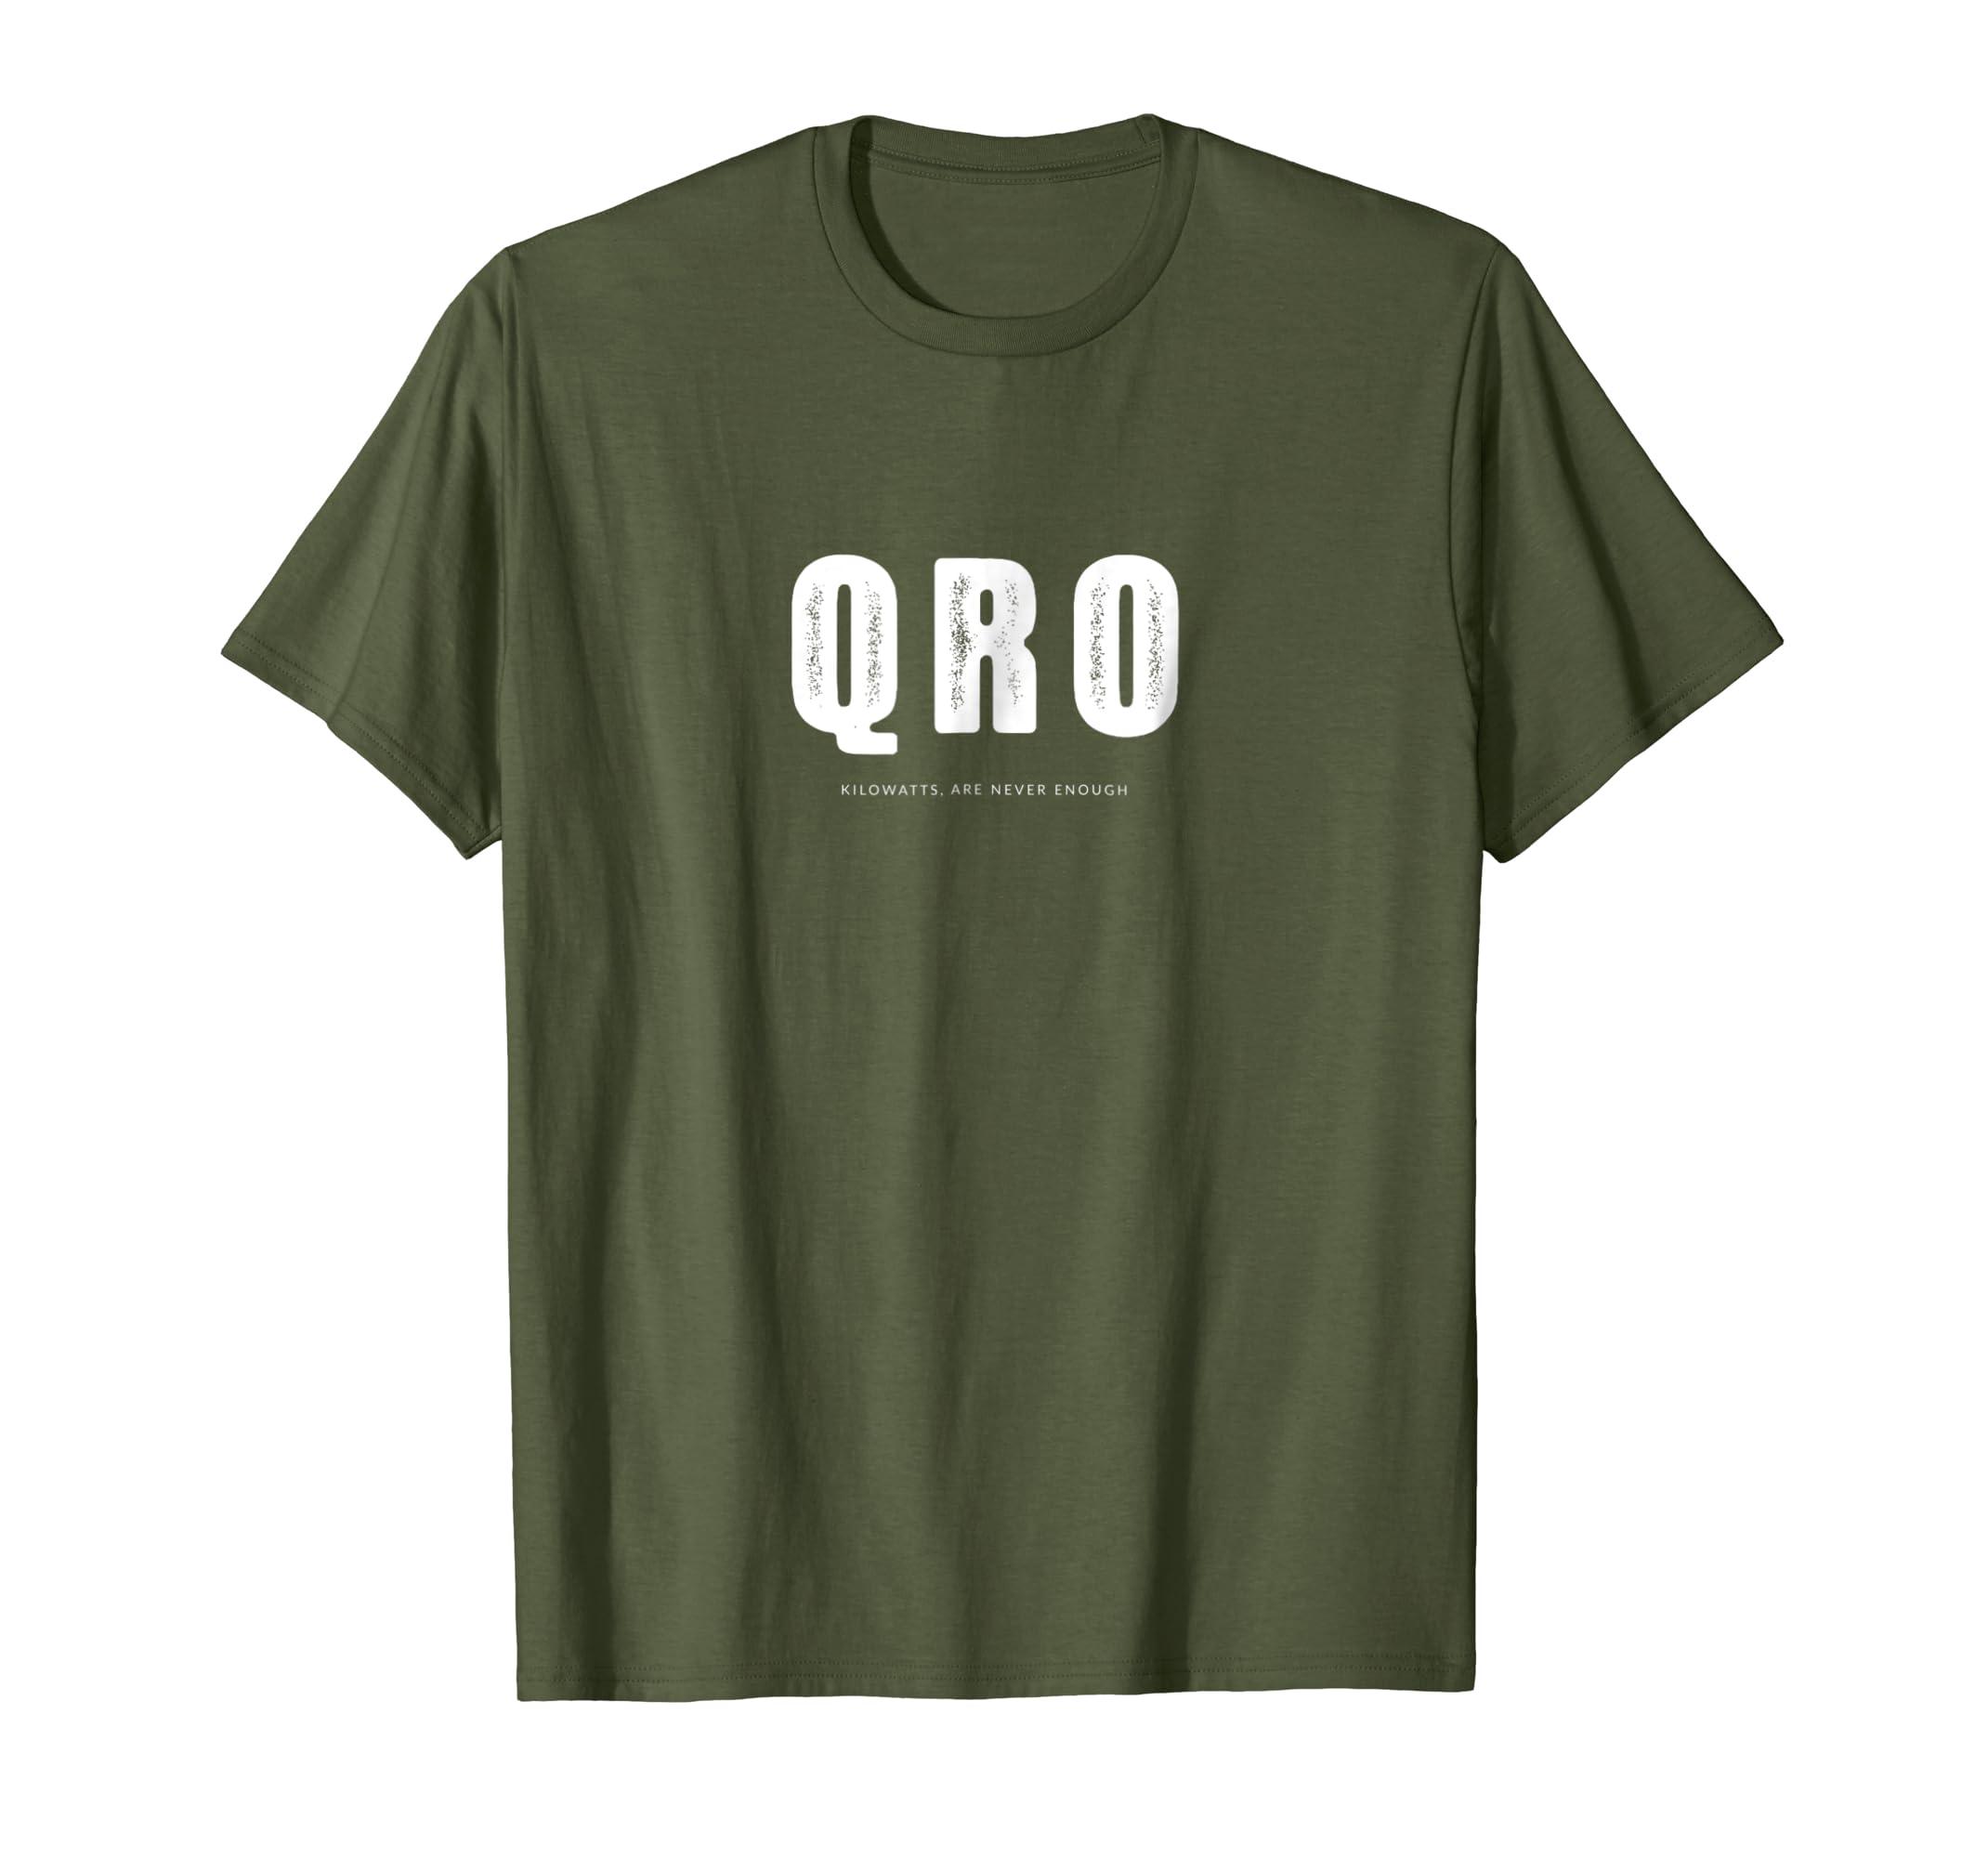 Ham Radio Outlet - Kilowatt Tee - QRO - Hamradio T-Shirt